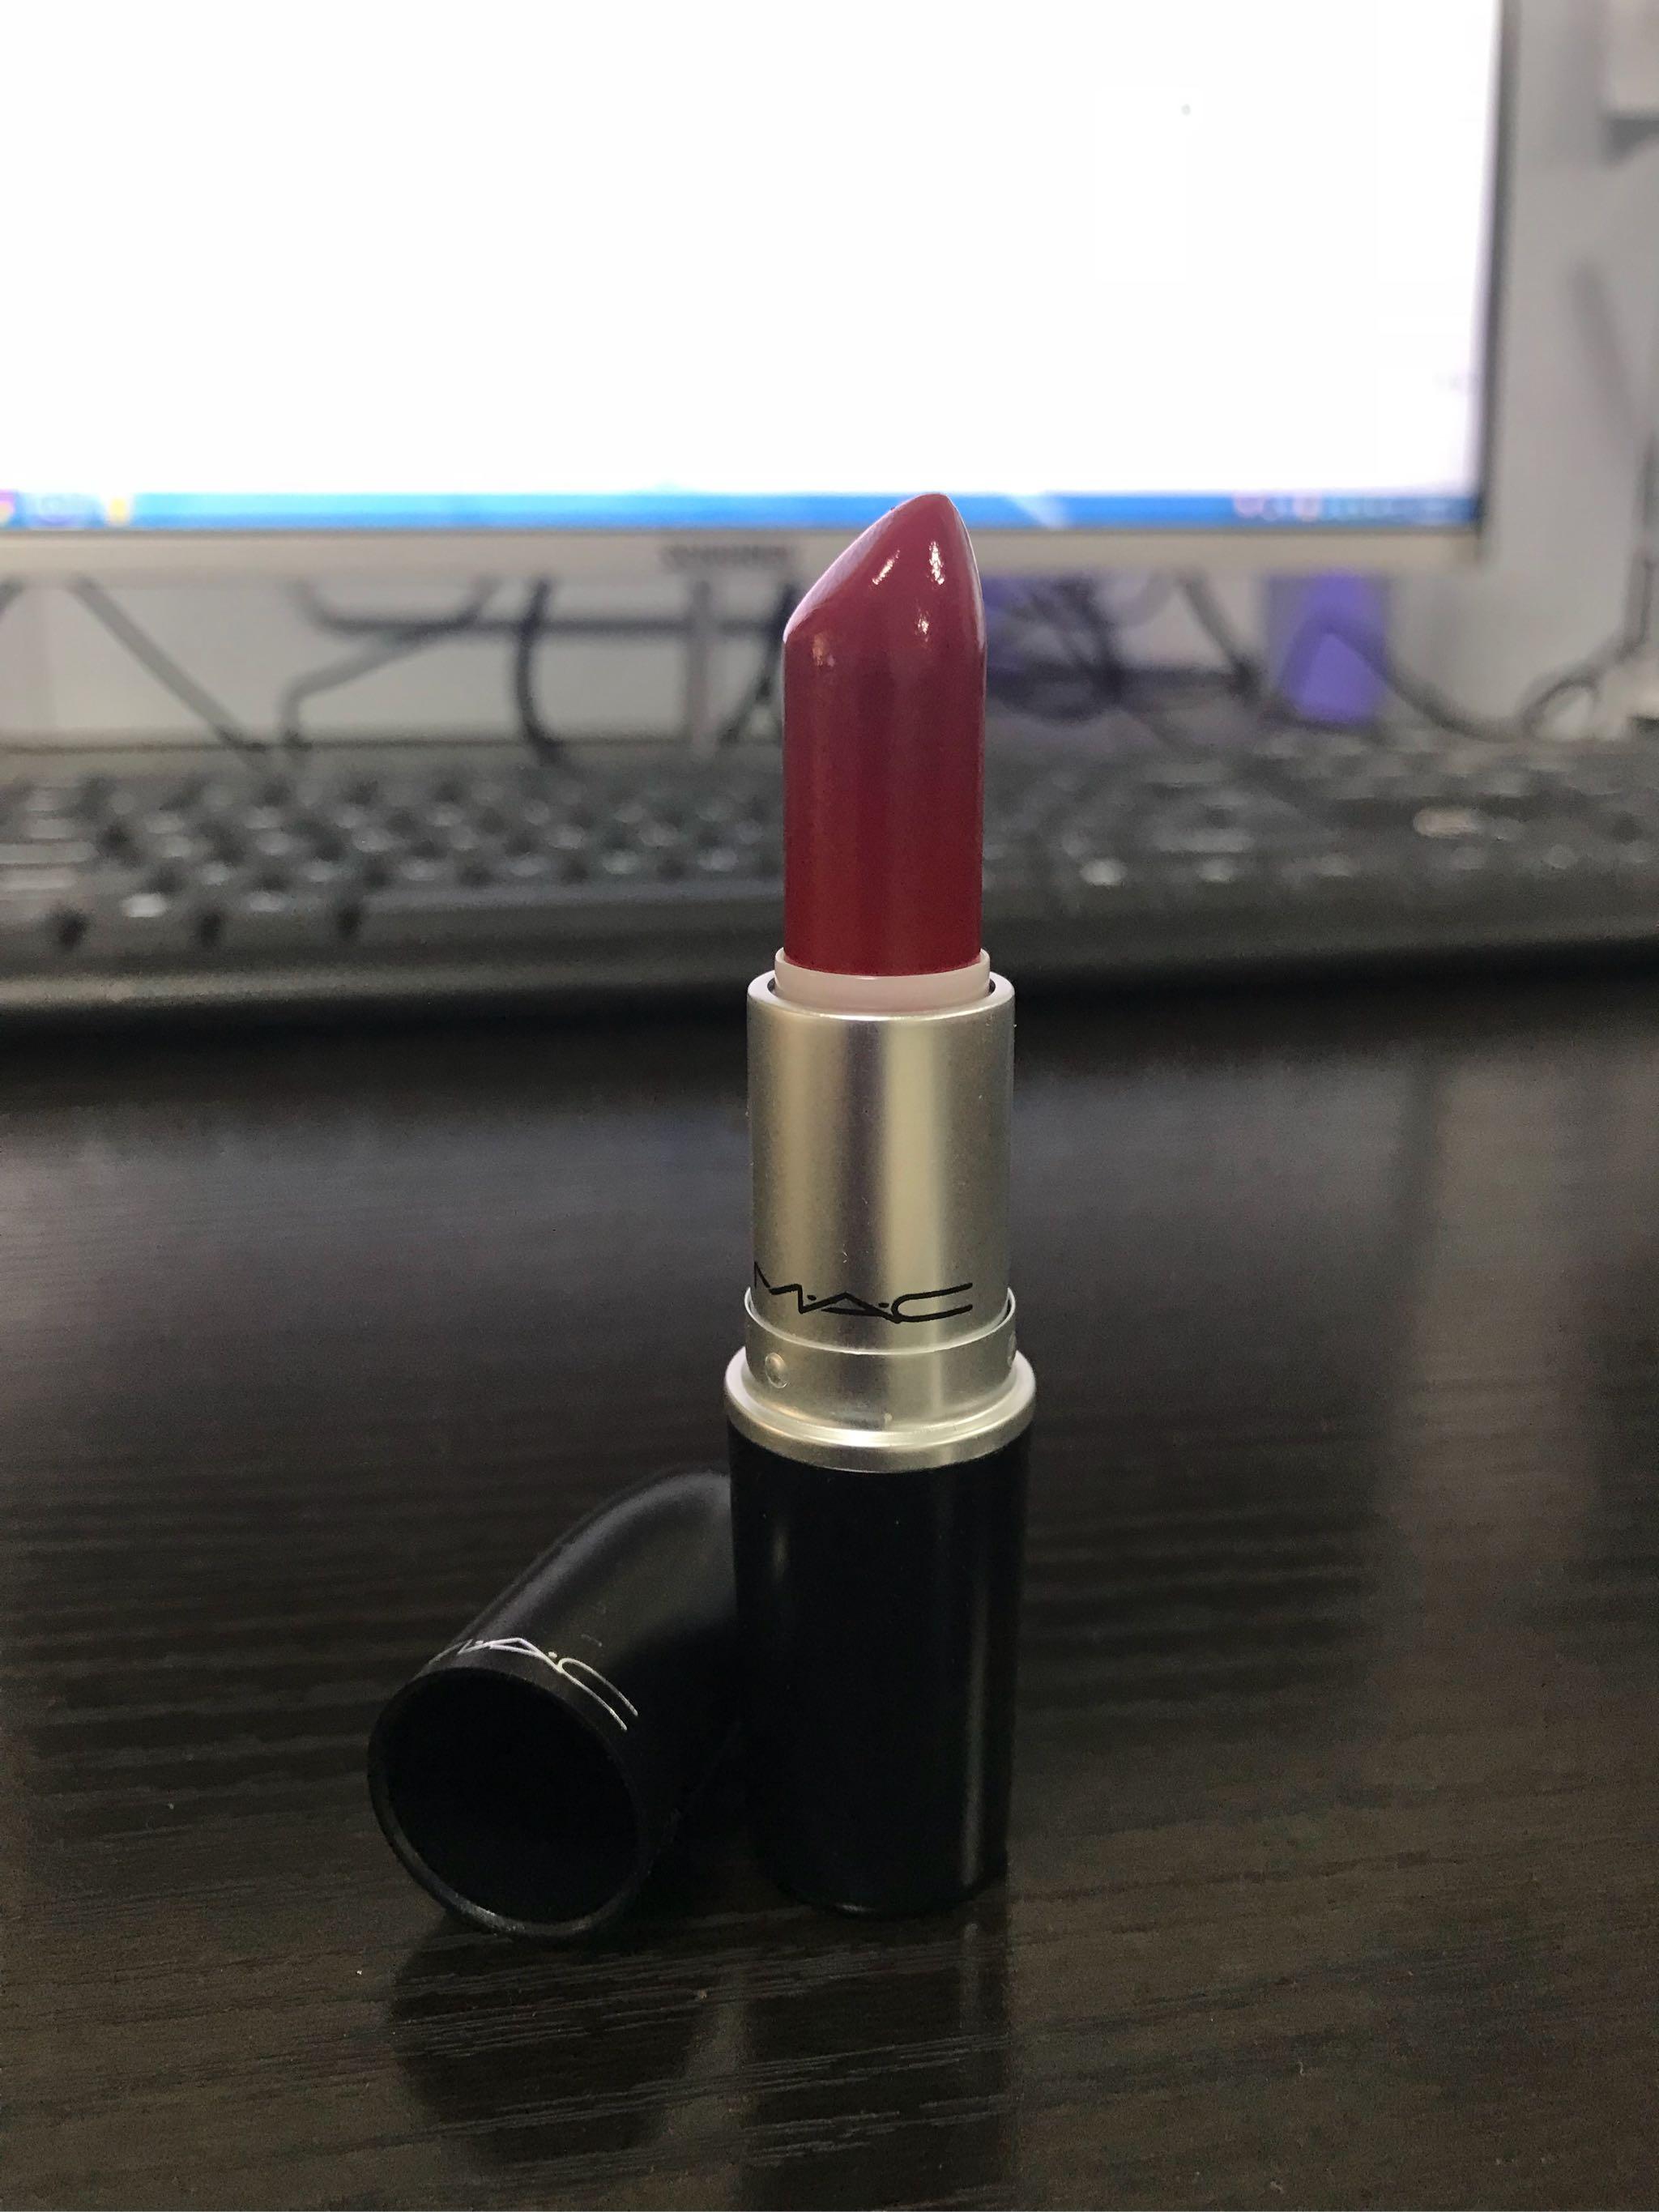 mac lady bug热卖番茄红口红试色——黄皮素颜显少女